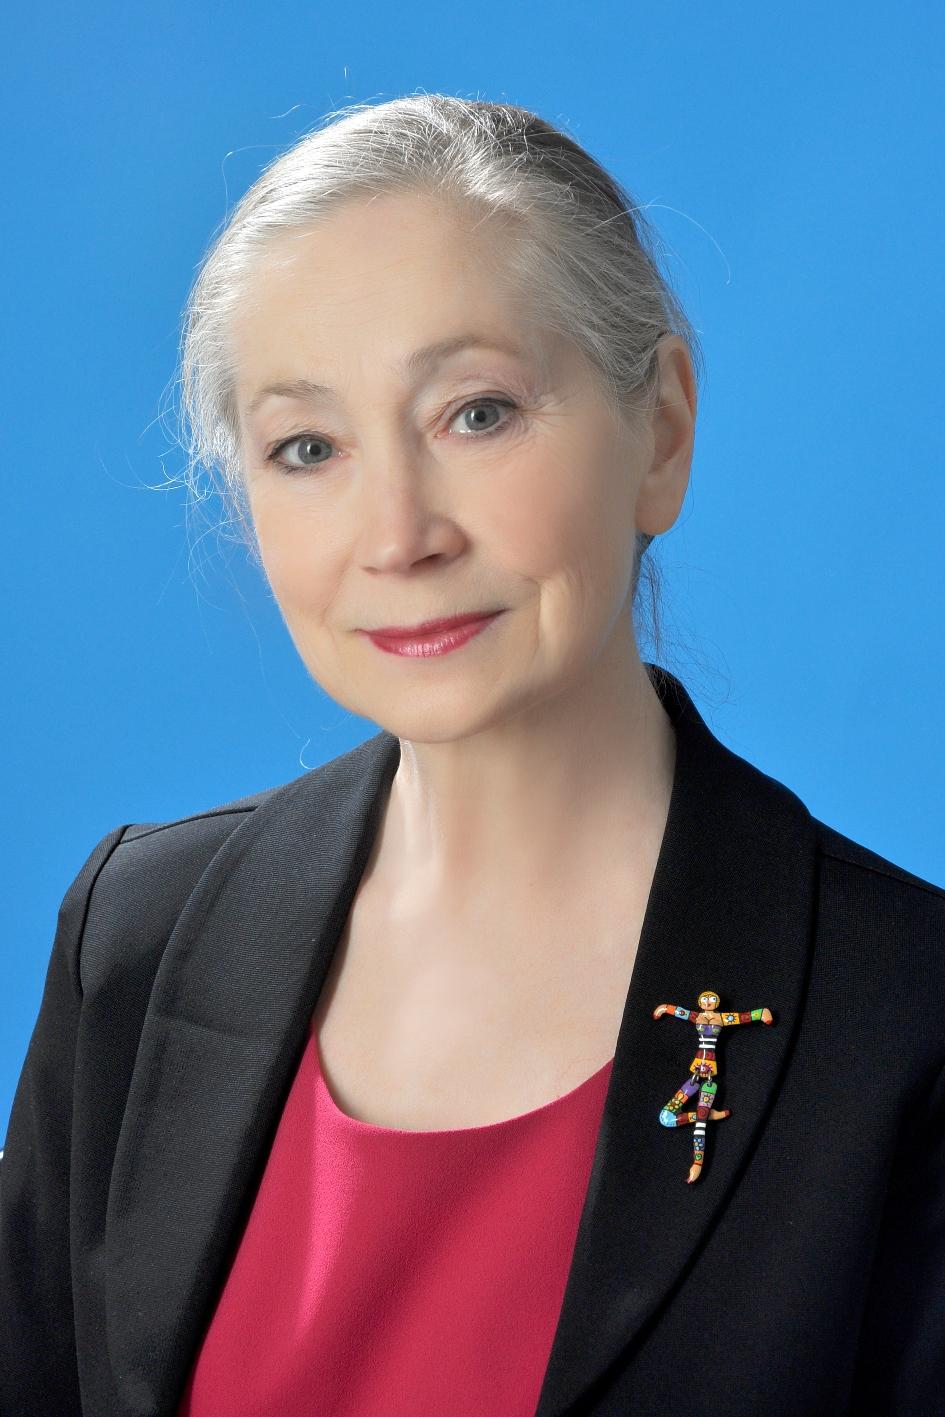 Франк Людмила Николаевна